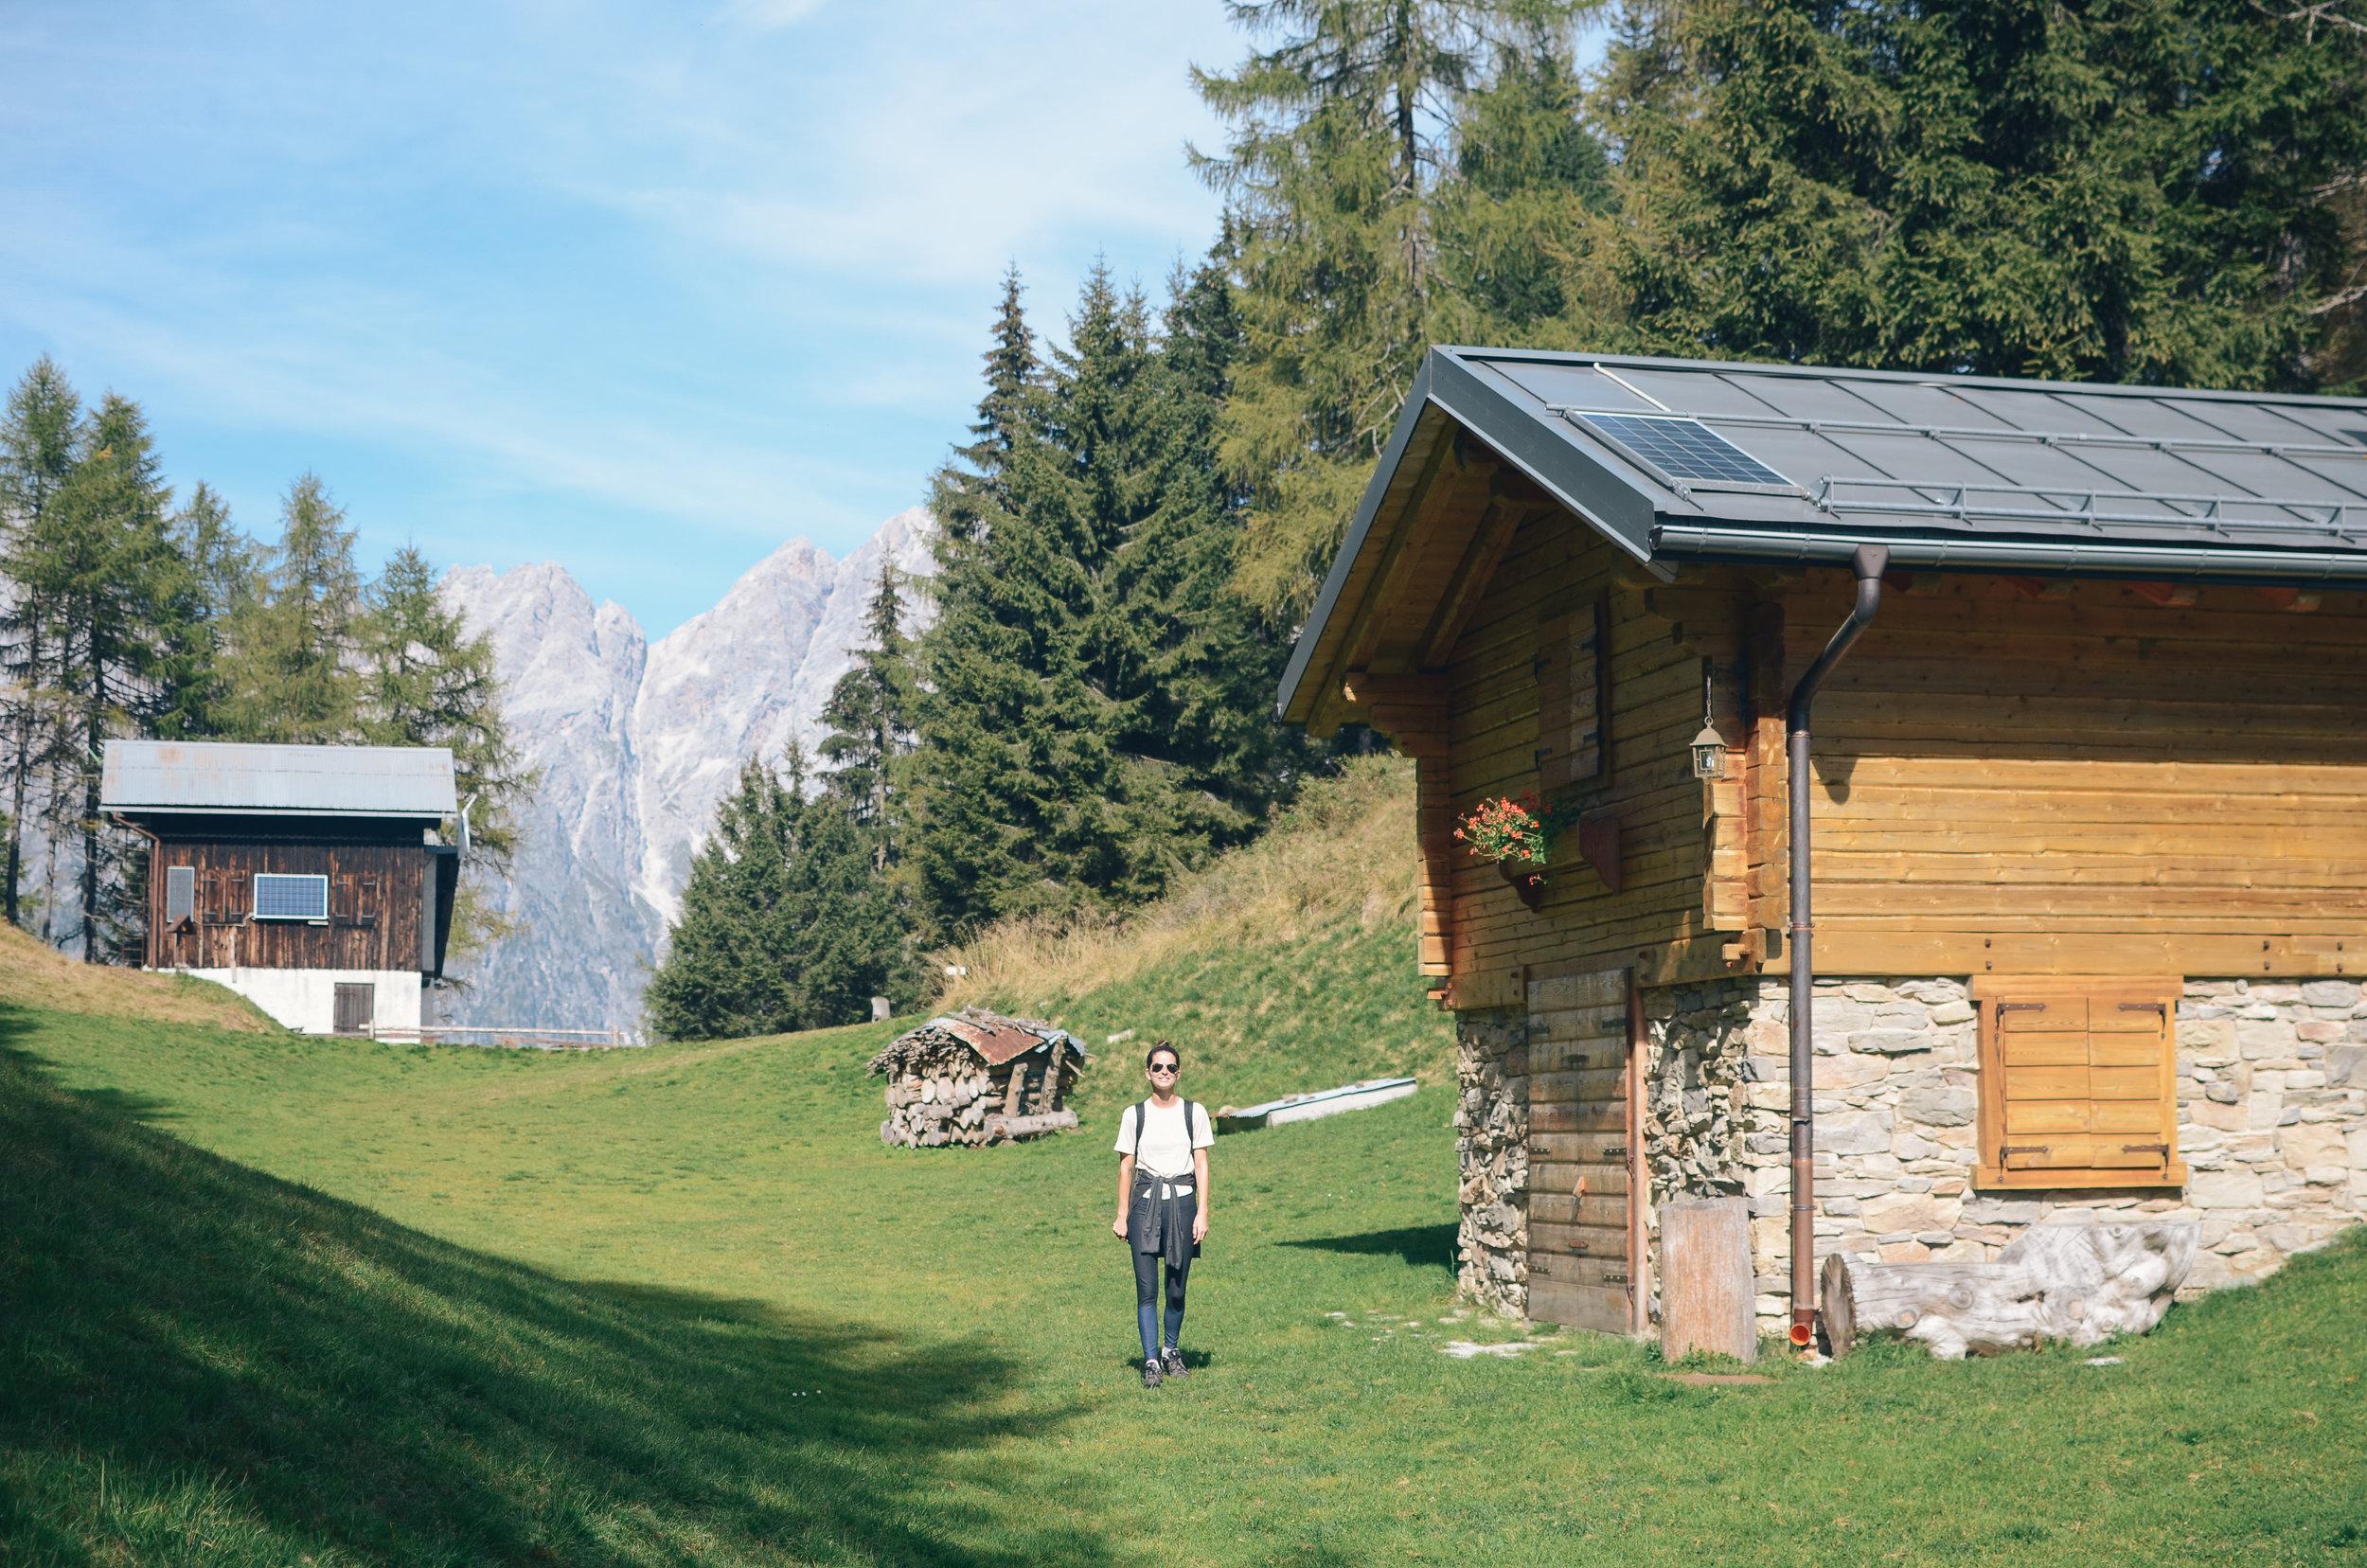 adventure-in-italy-3-hikes-dolomites-hiking-travel-blog-tyrol-5.jpg